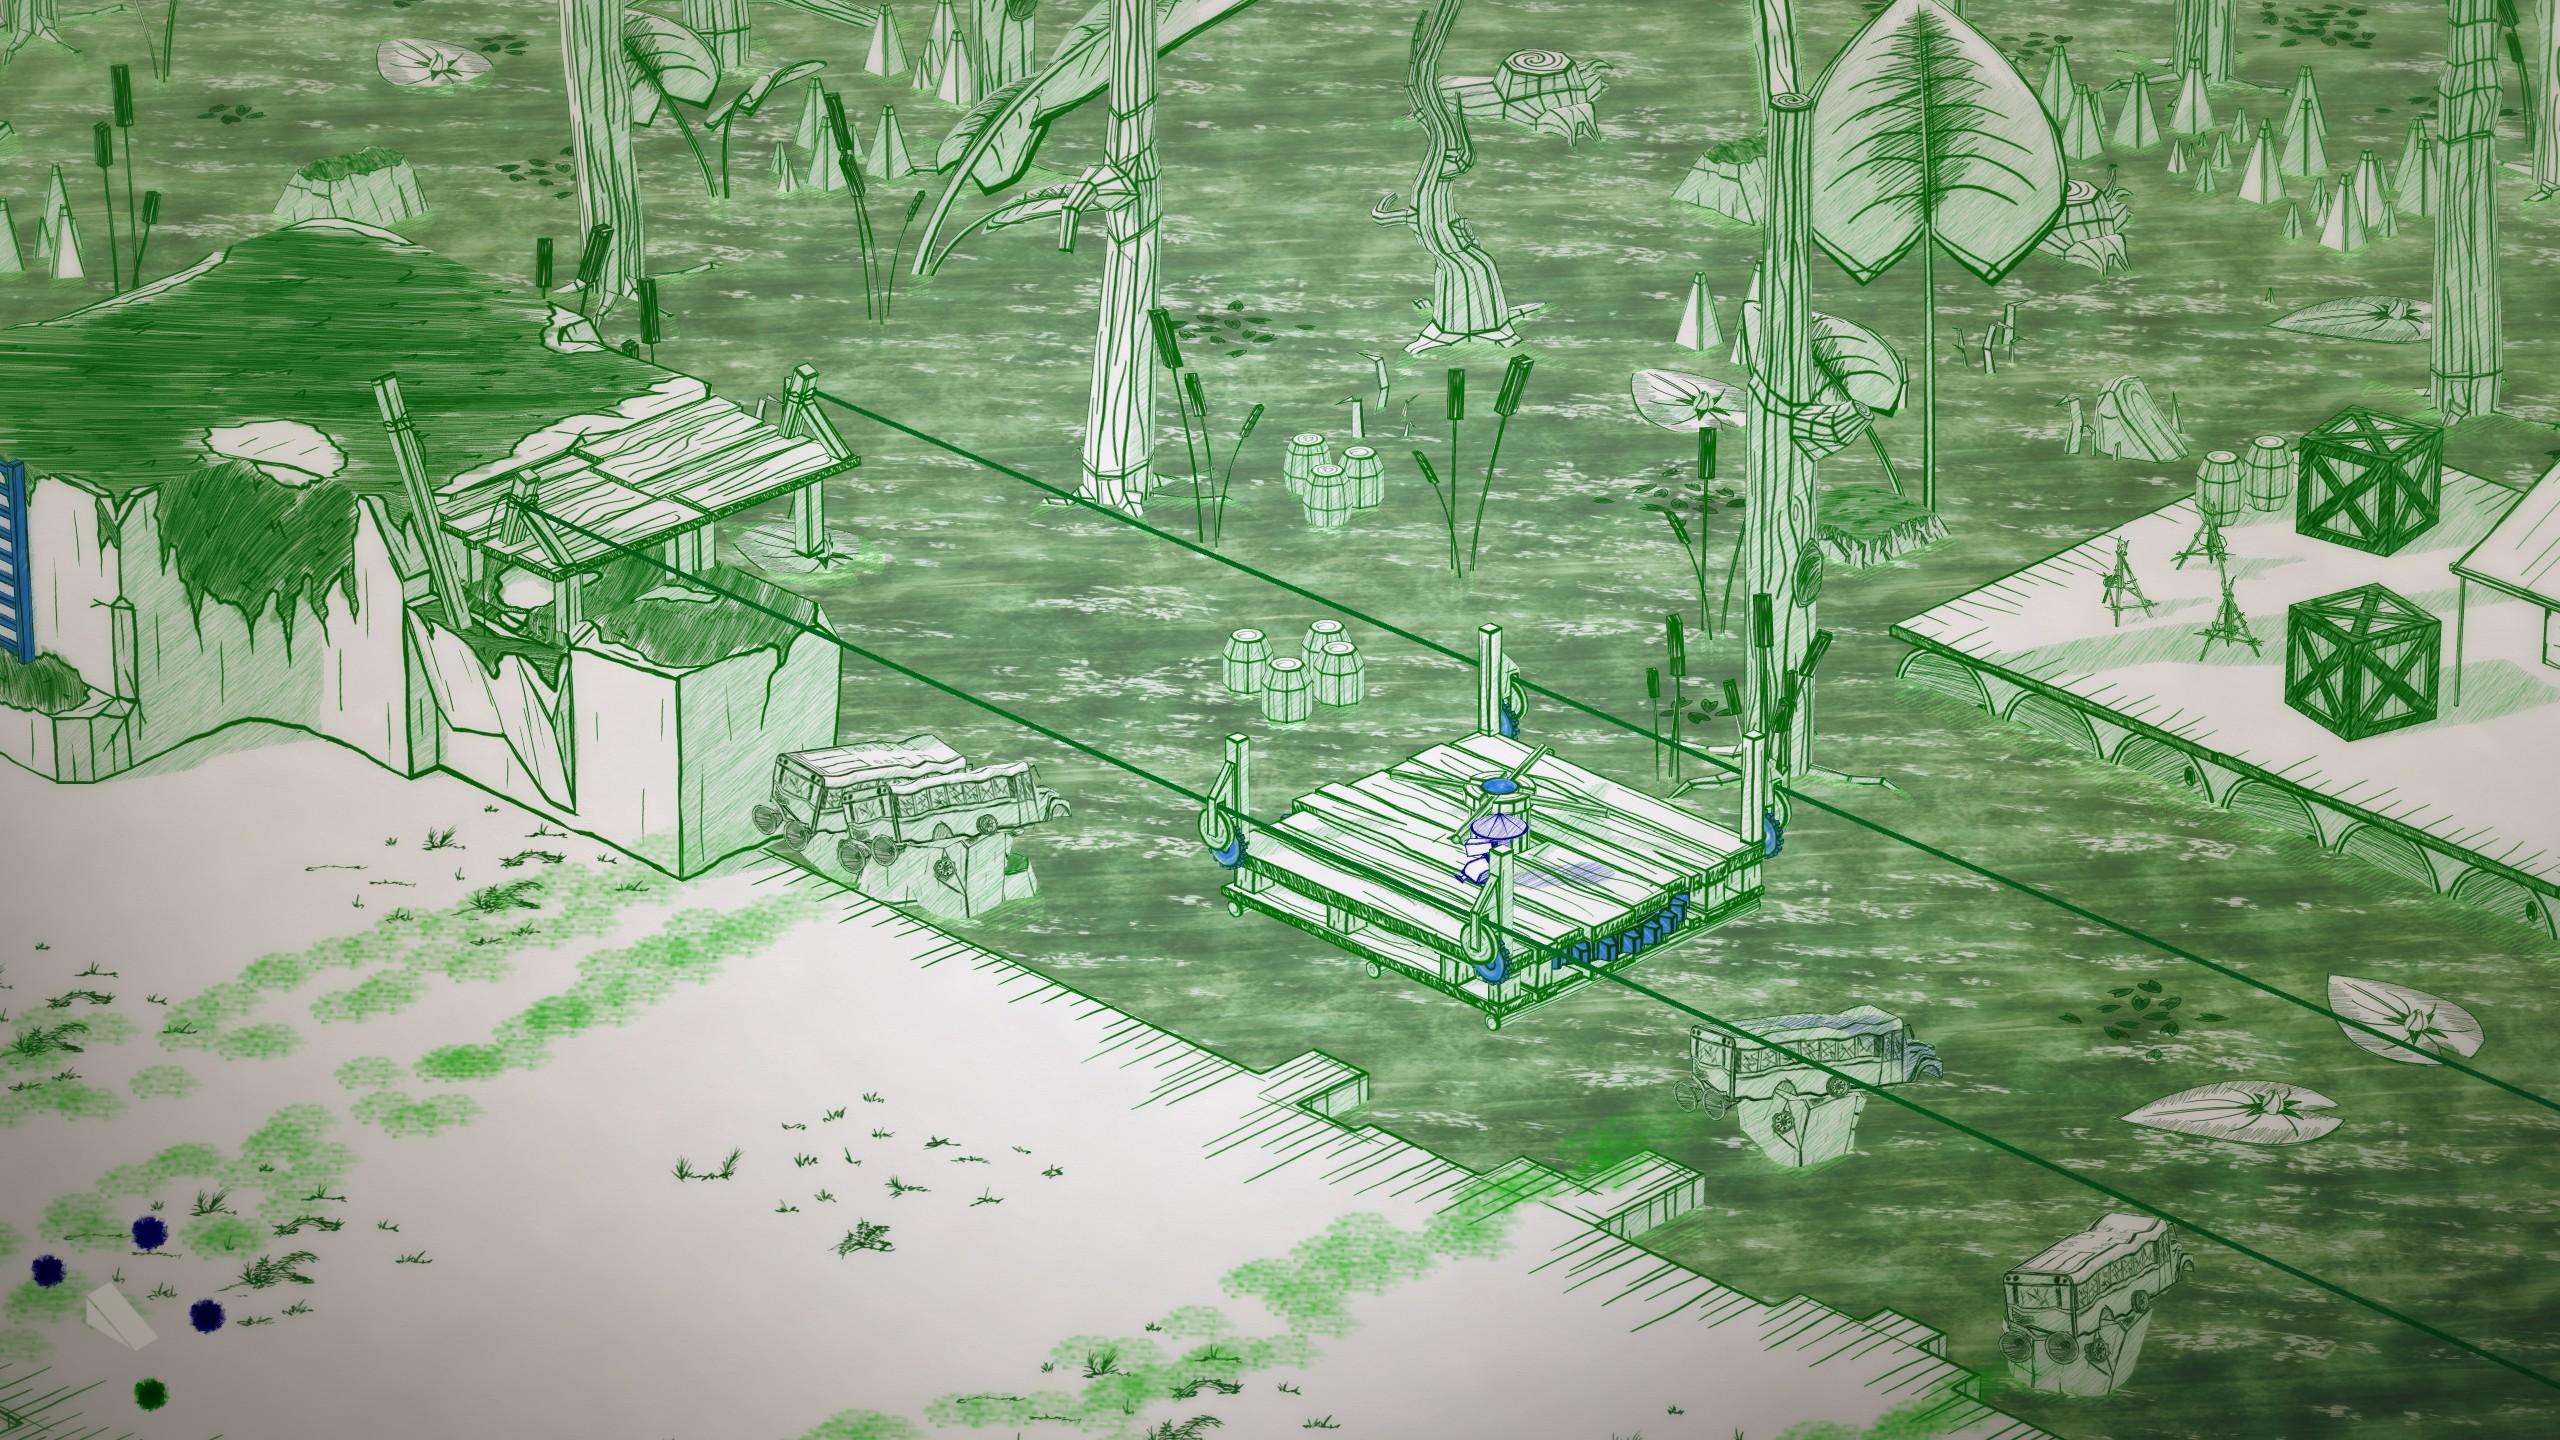 Inked - swamp